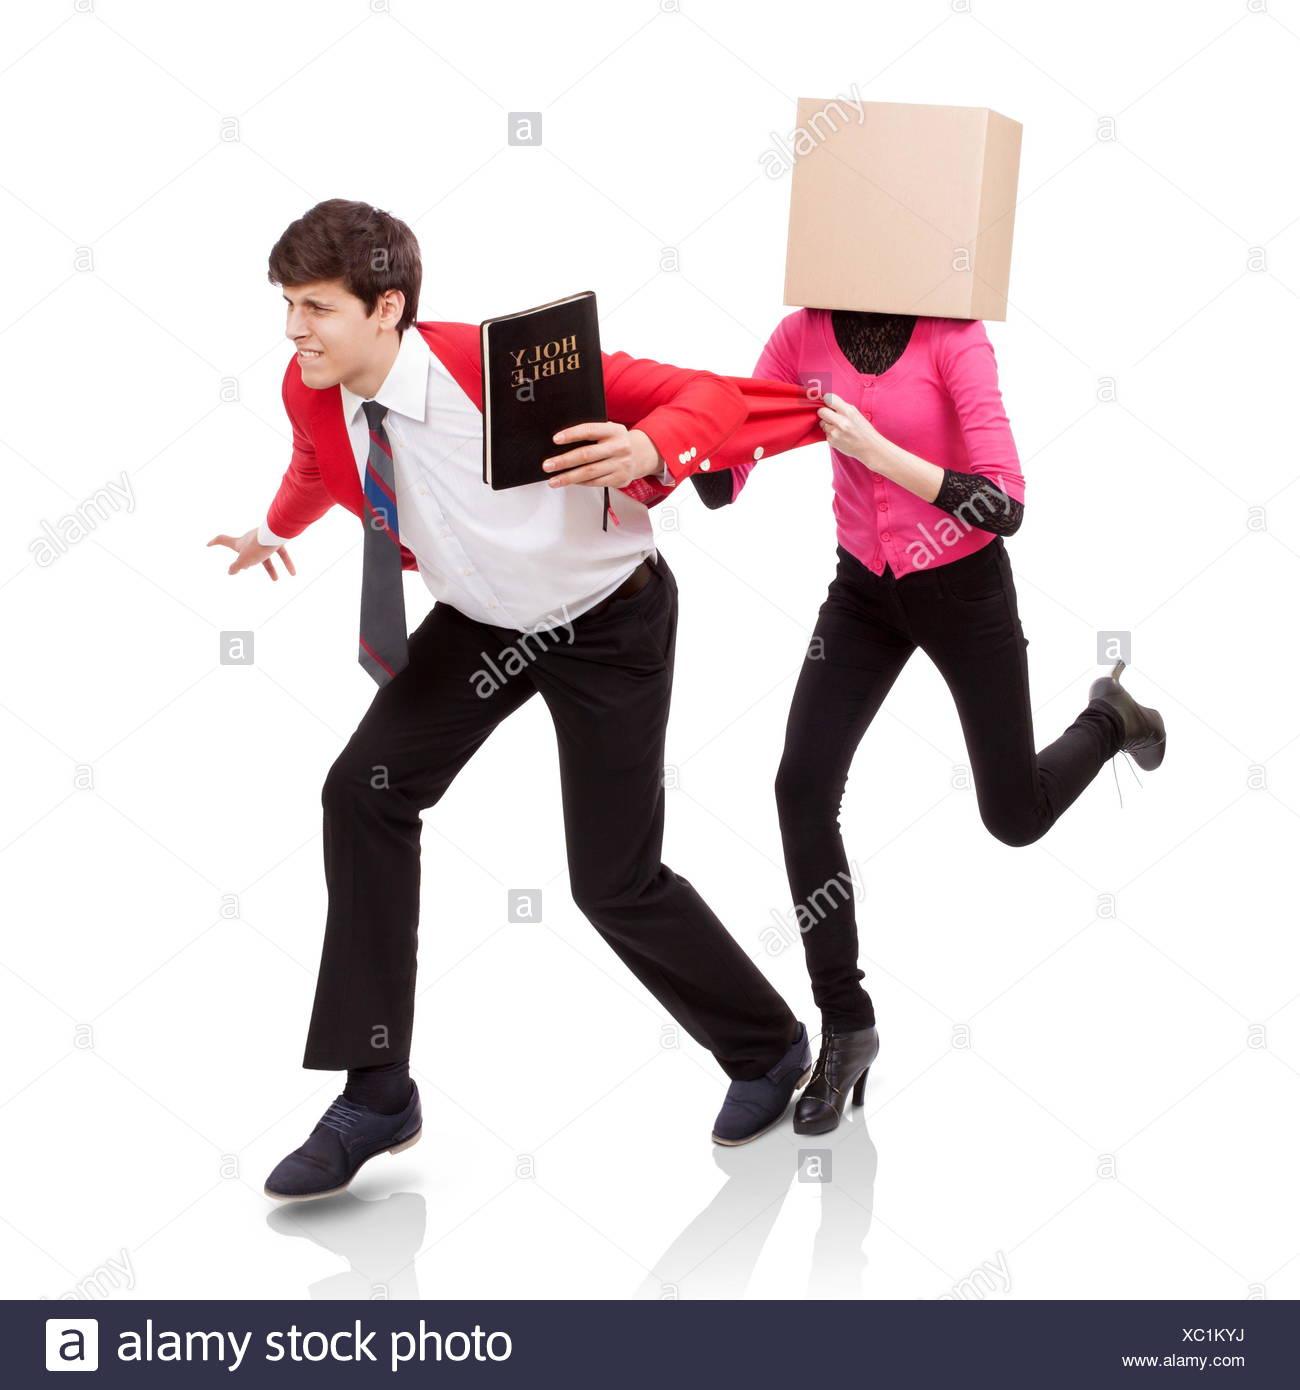 Flee the evil desire - Stock Image